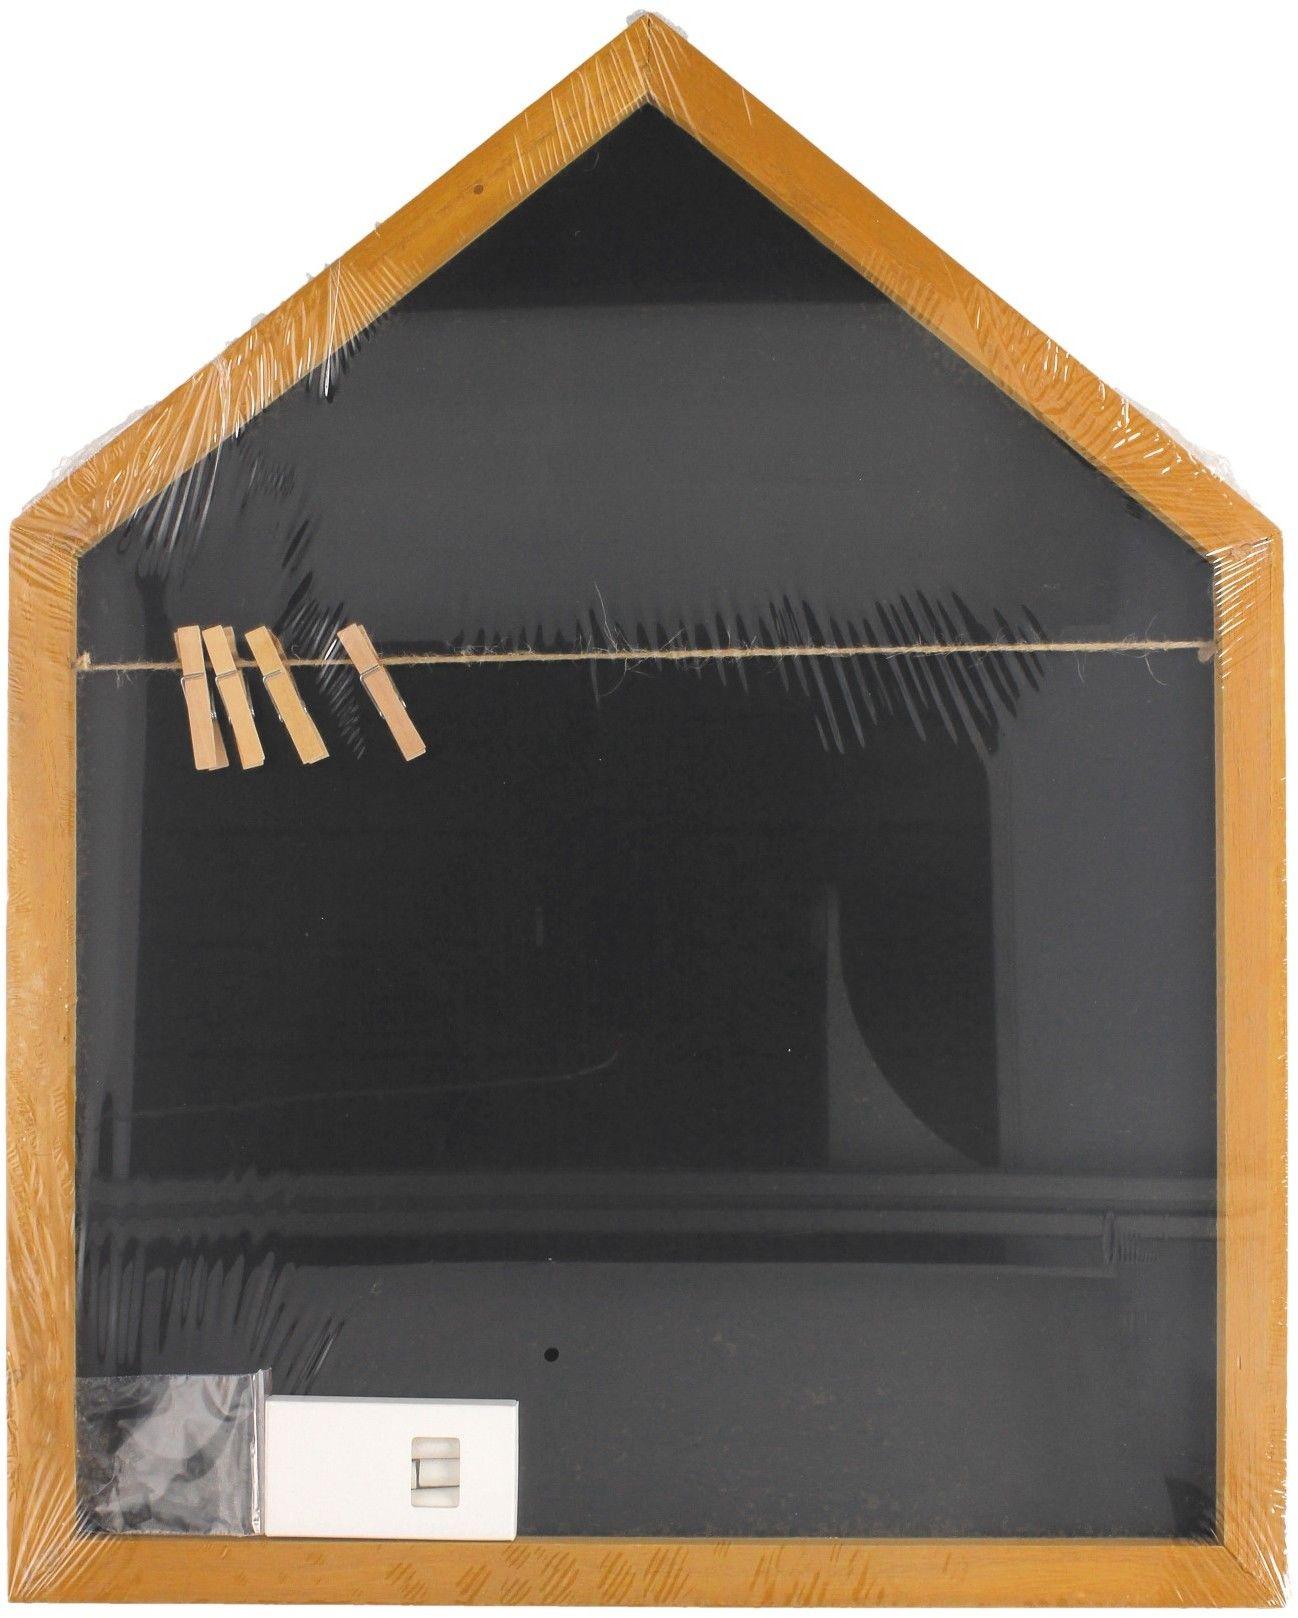 Tablica kredowa DOMEK z klamerkami 40x50cm